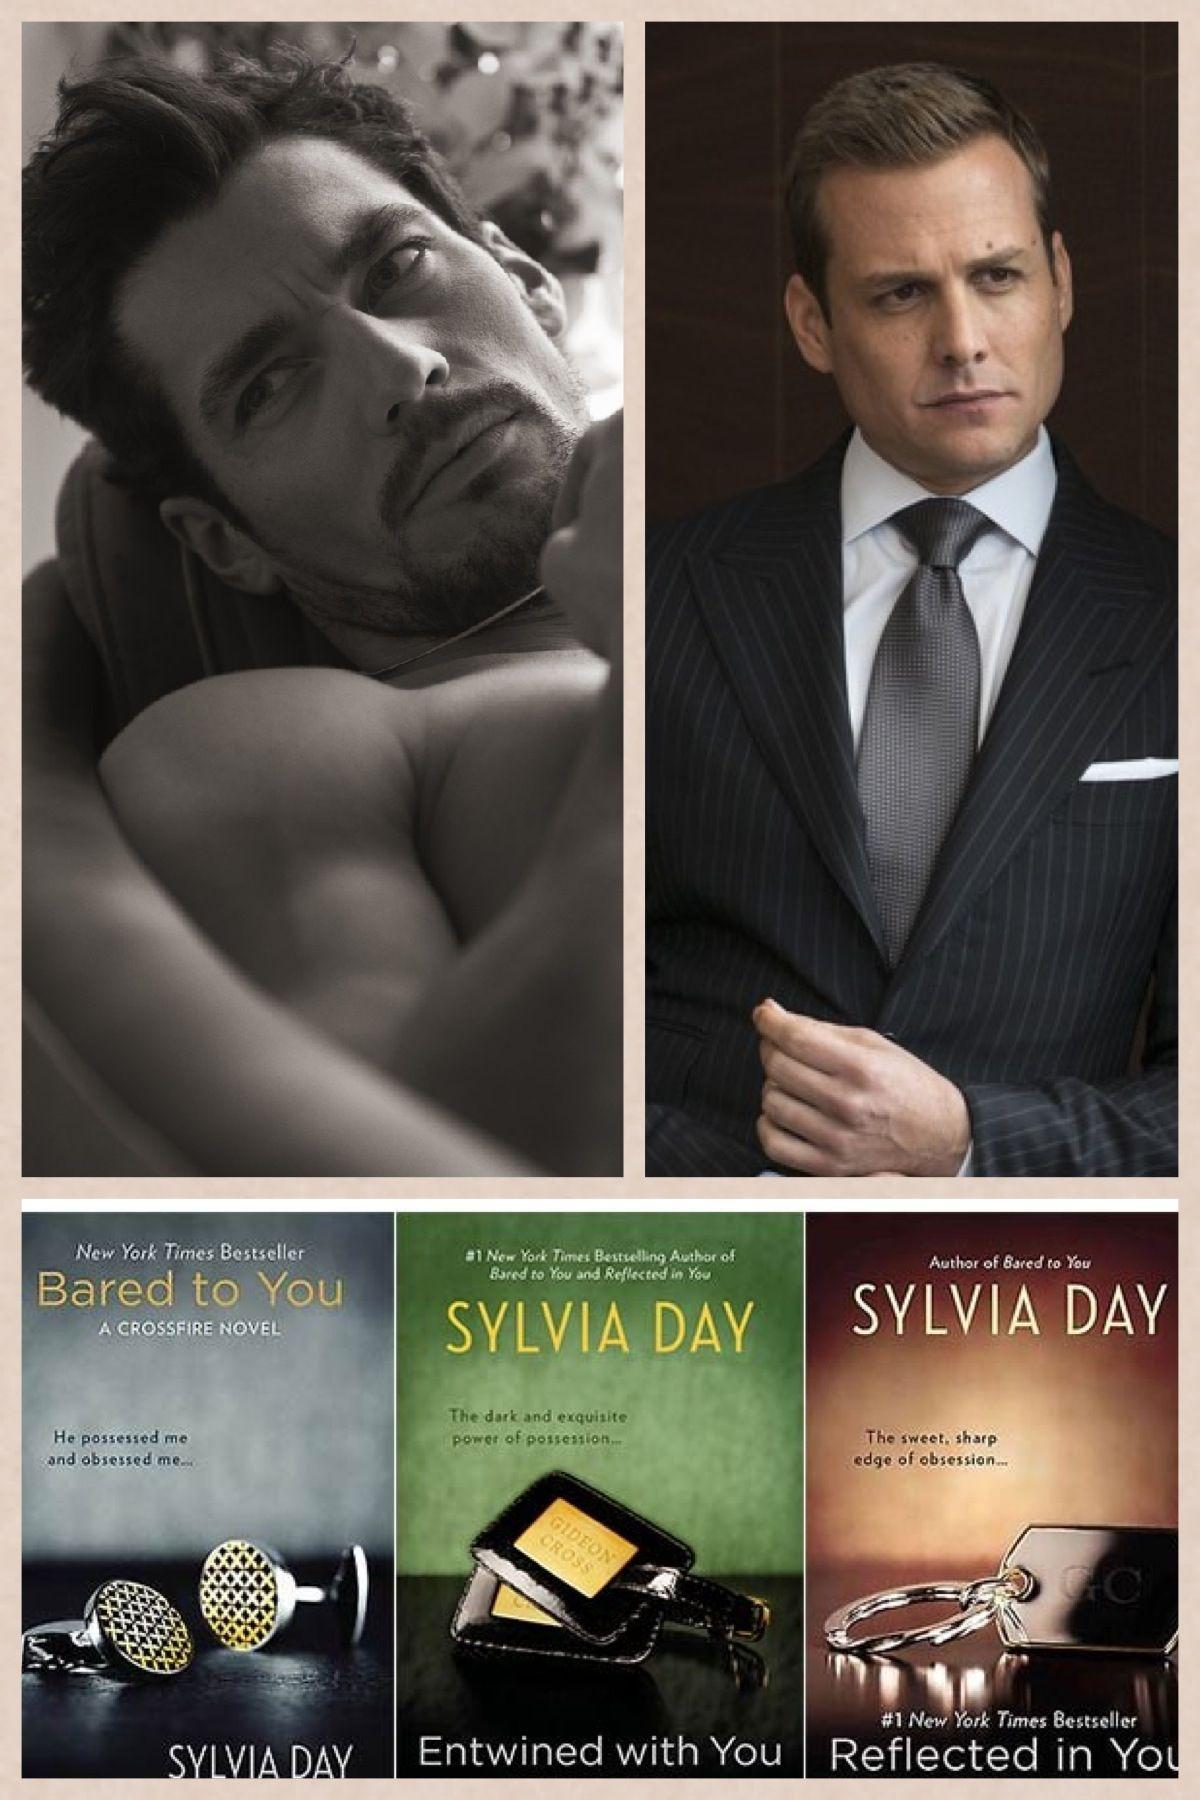 Book Boyfriend David Gandy Gabriel Macht as Gideon Cross